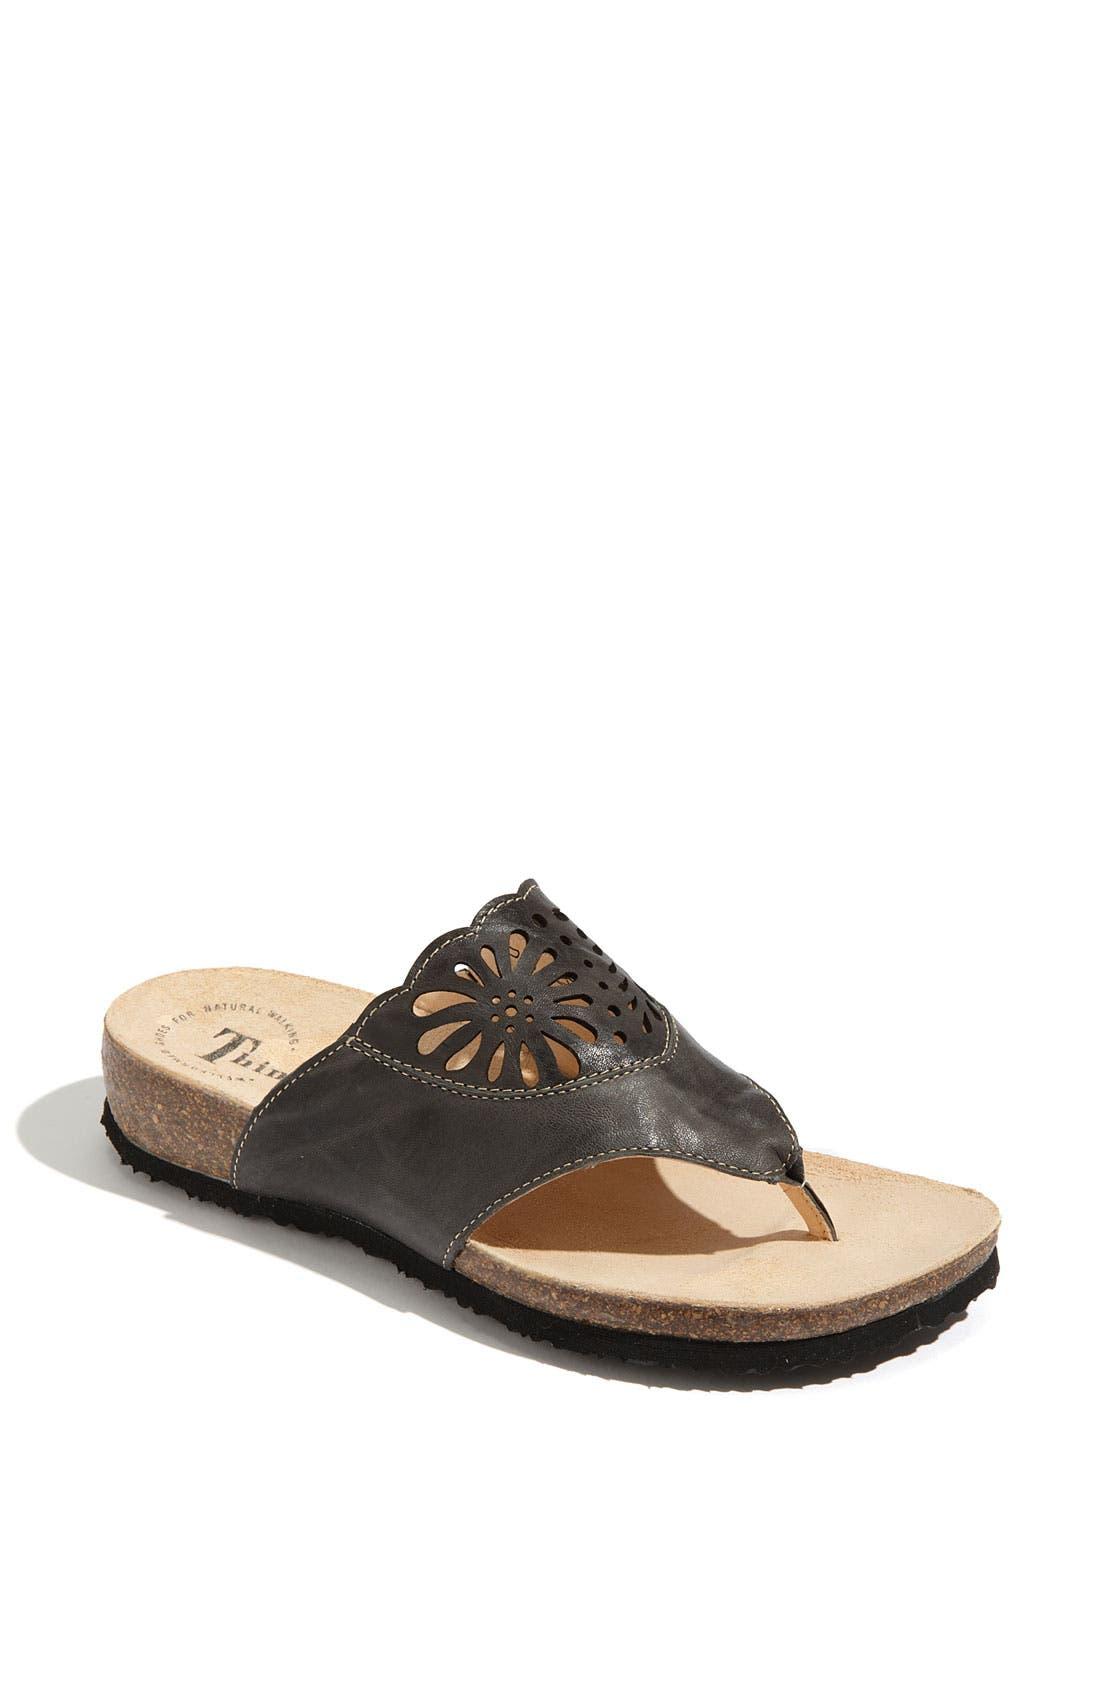 Alternate Image 1 Selected - Think! 'Julia' Thong Sandal